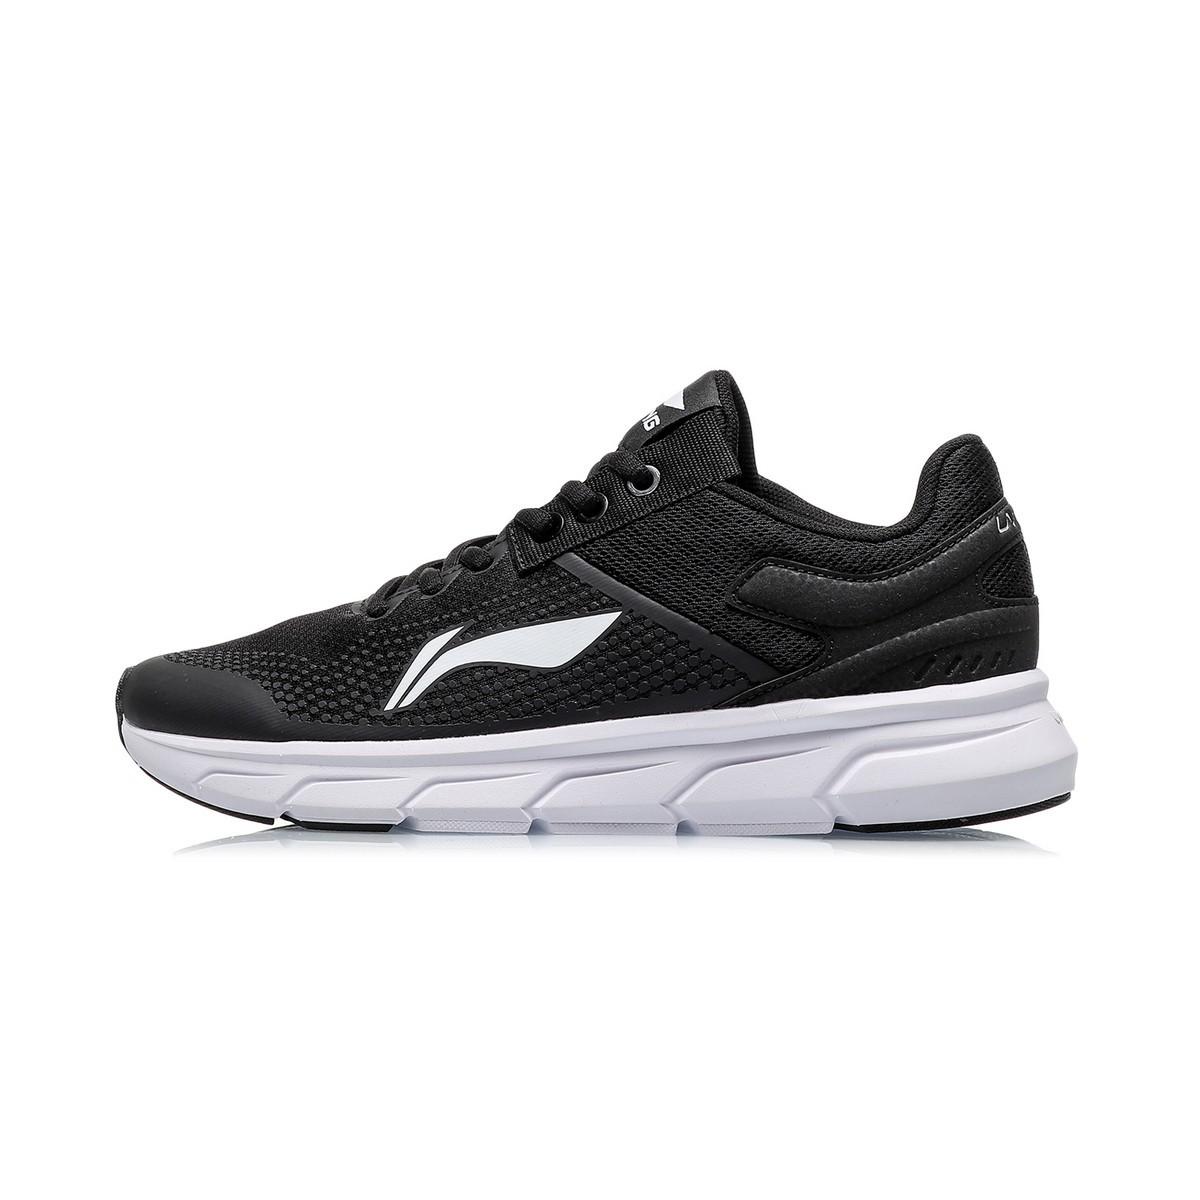 LI-NING 李宁 女士跑鞋 ARHQ246-1 黑色 35